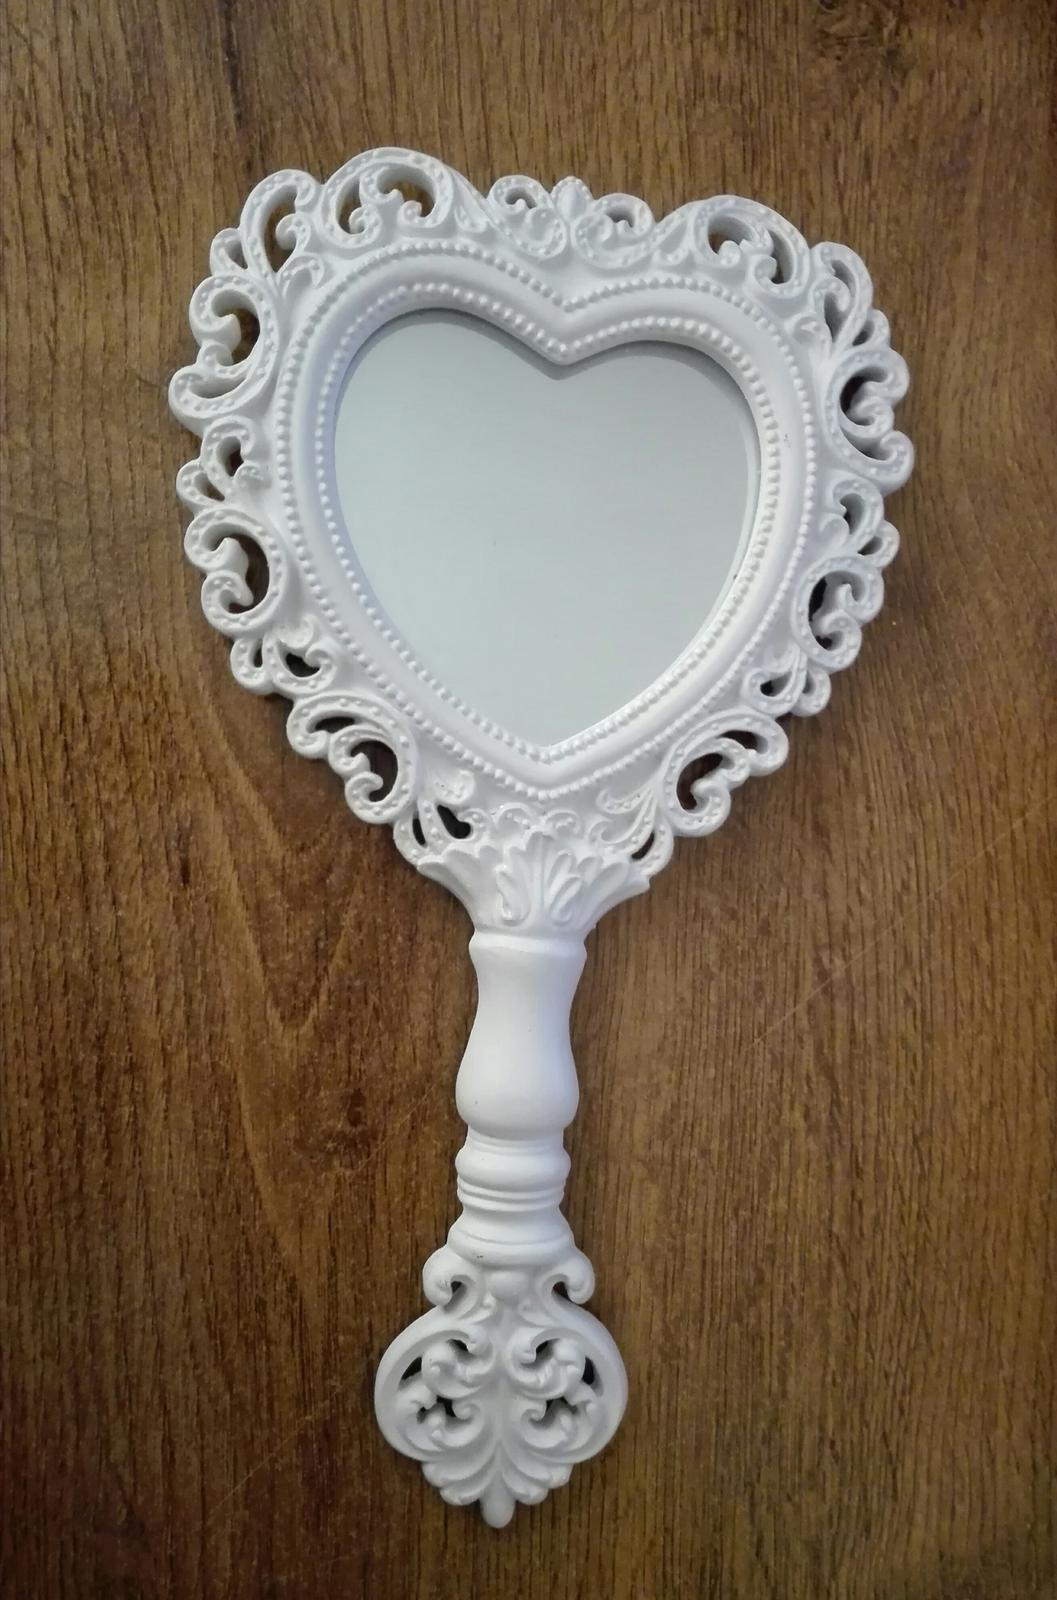 Svadobné zrkadlo - Obrázok č. 1